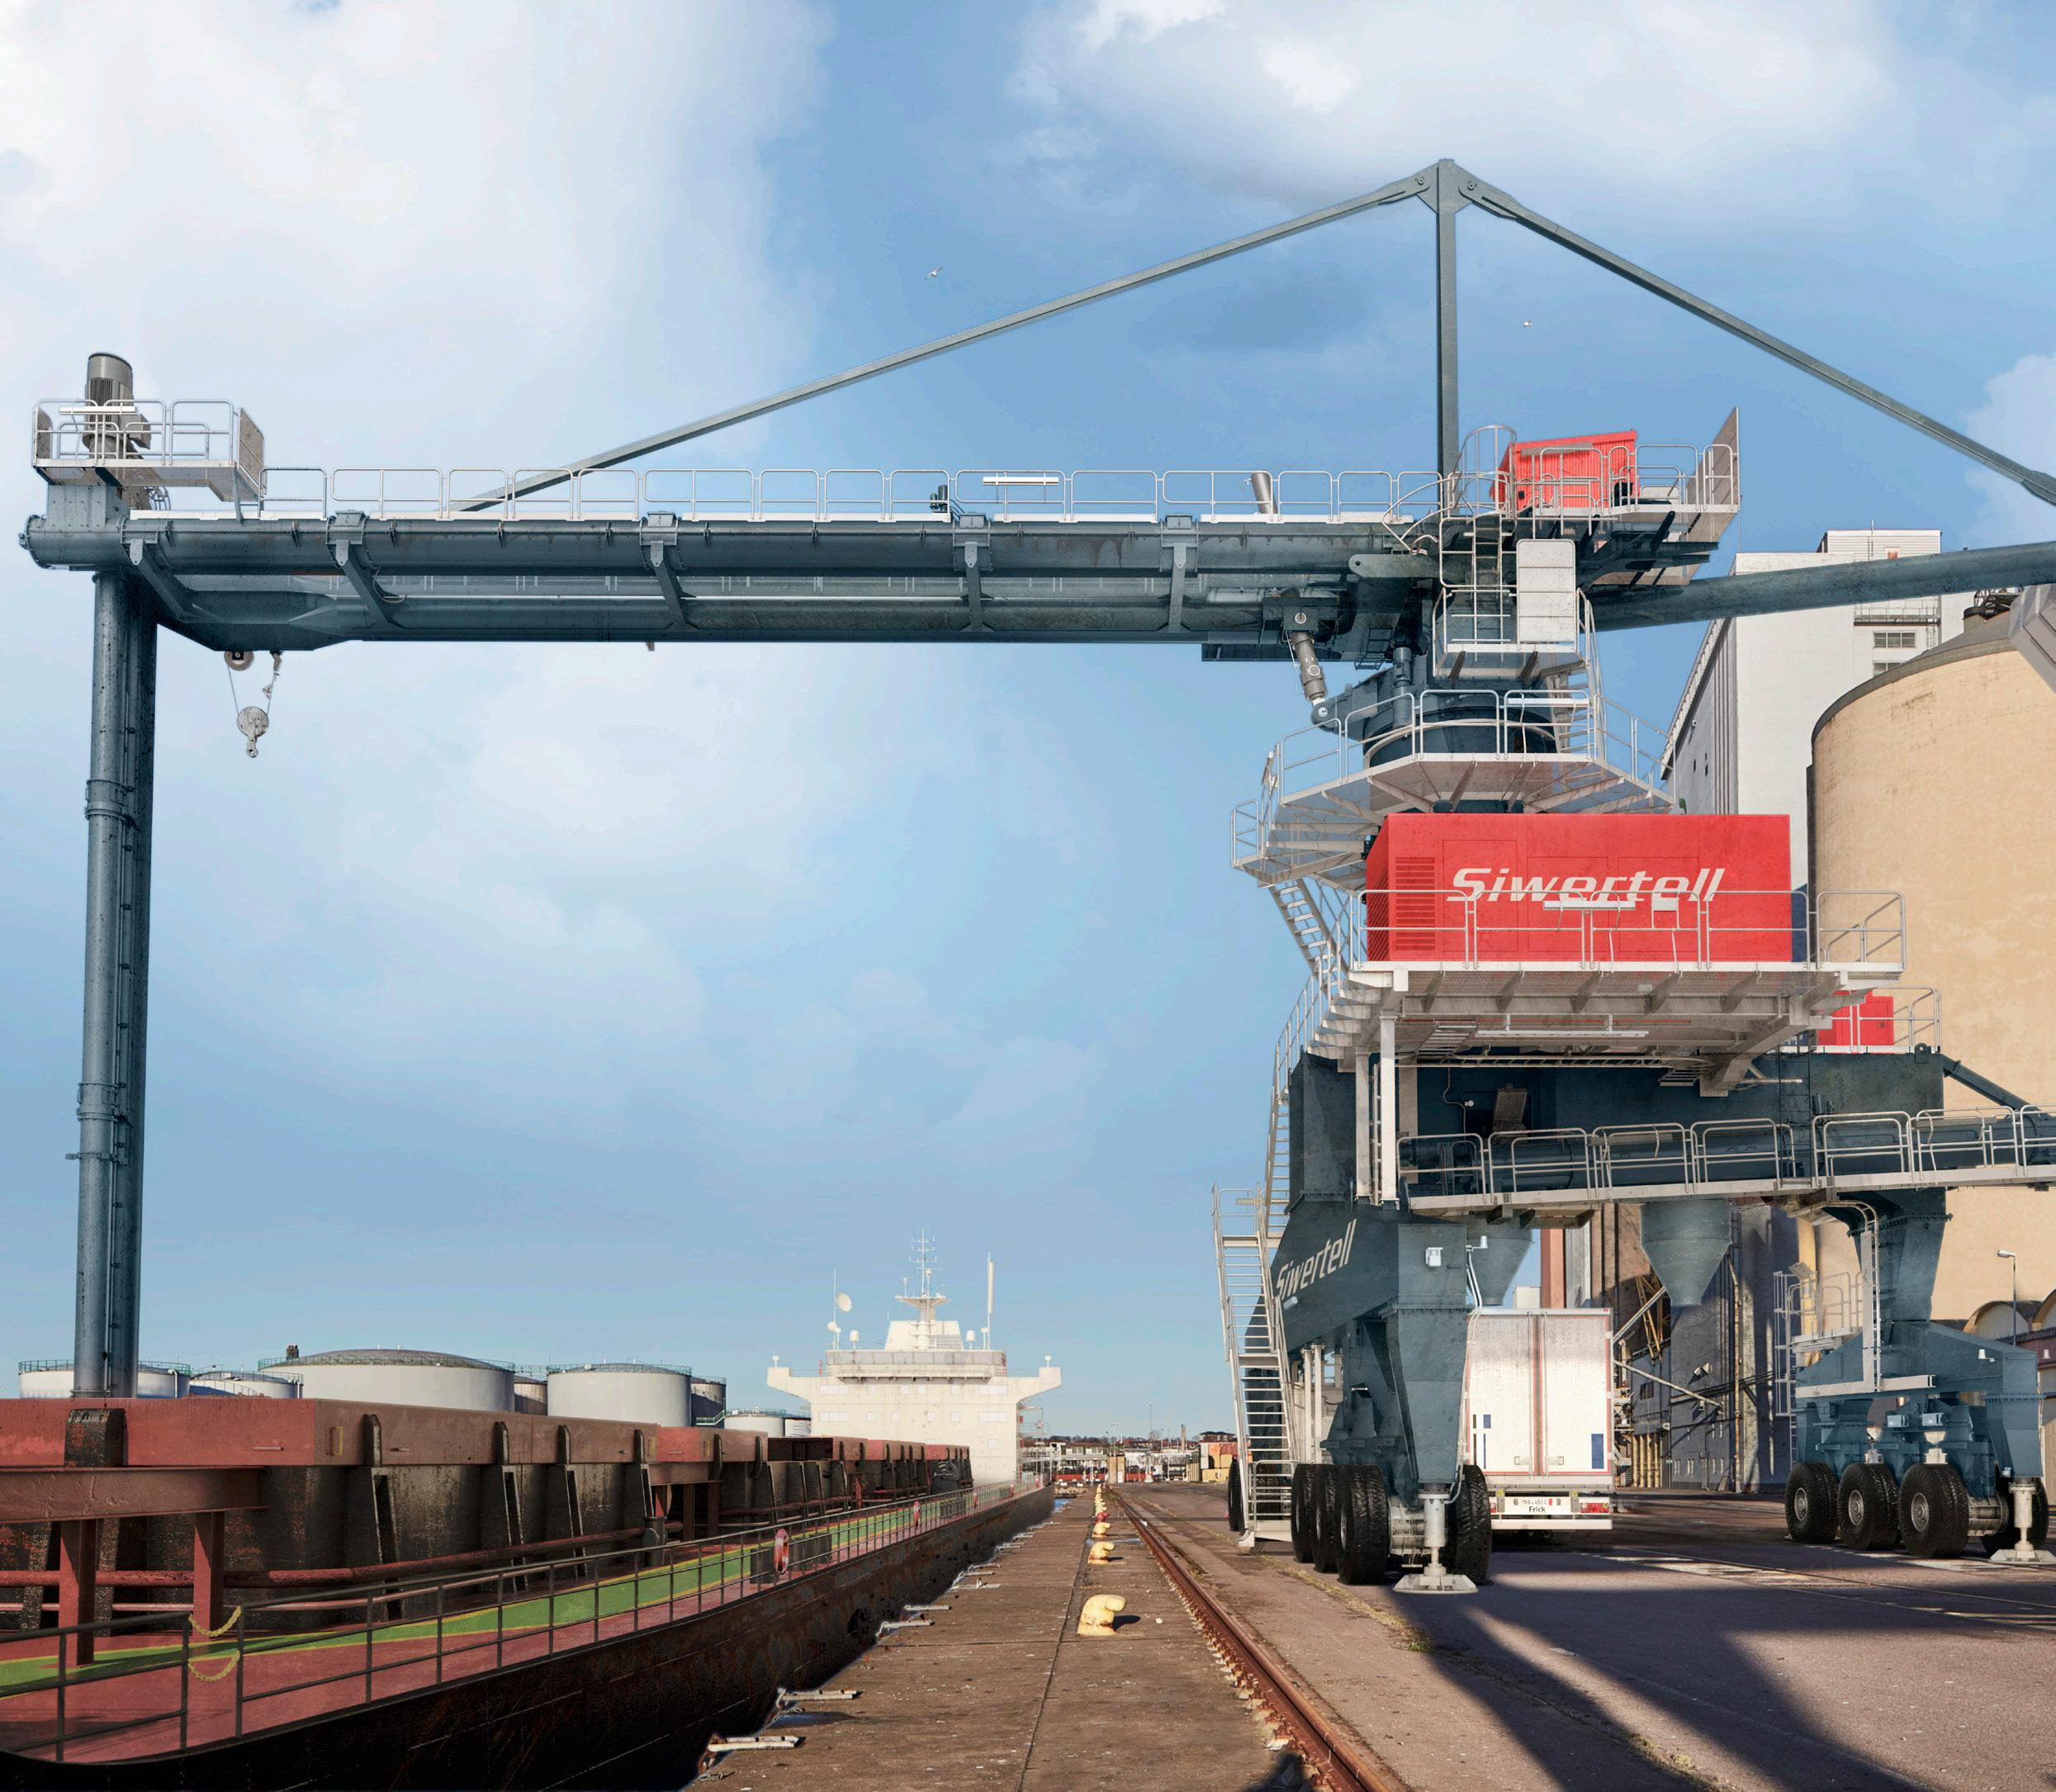 Page 1 of Port-mobile Siwertell grain unloader